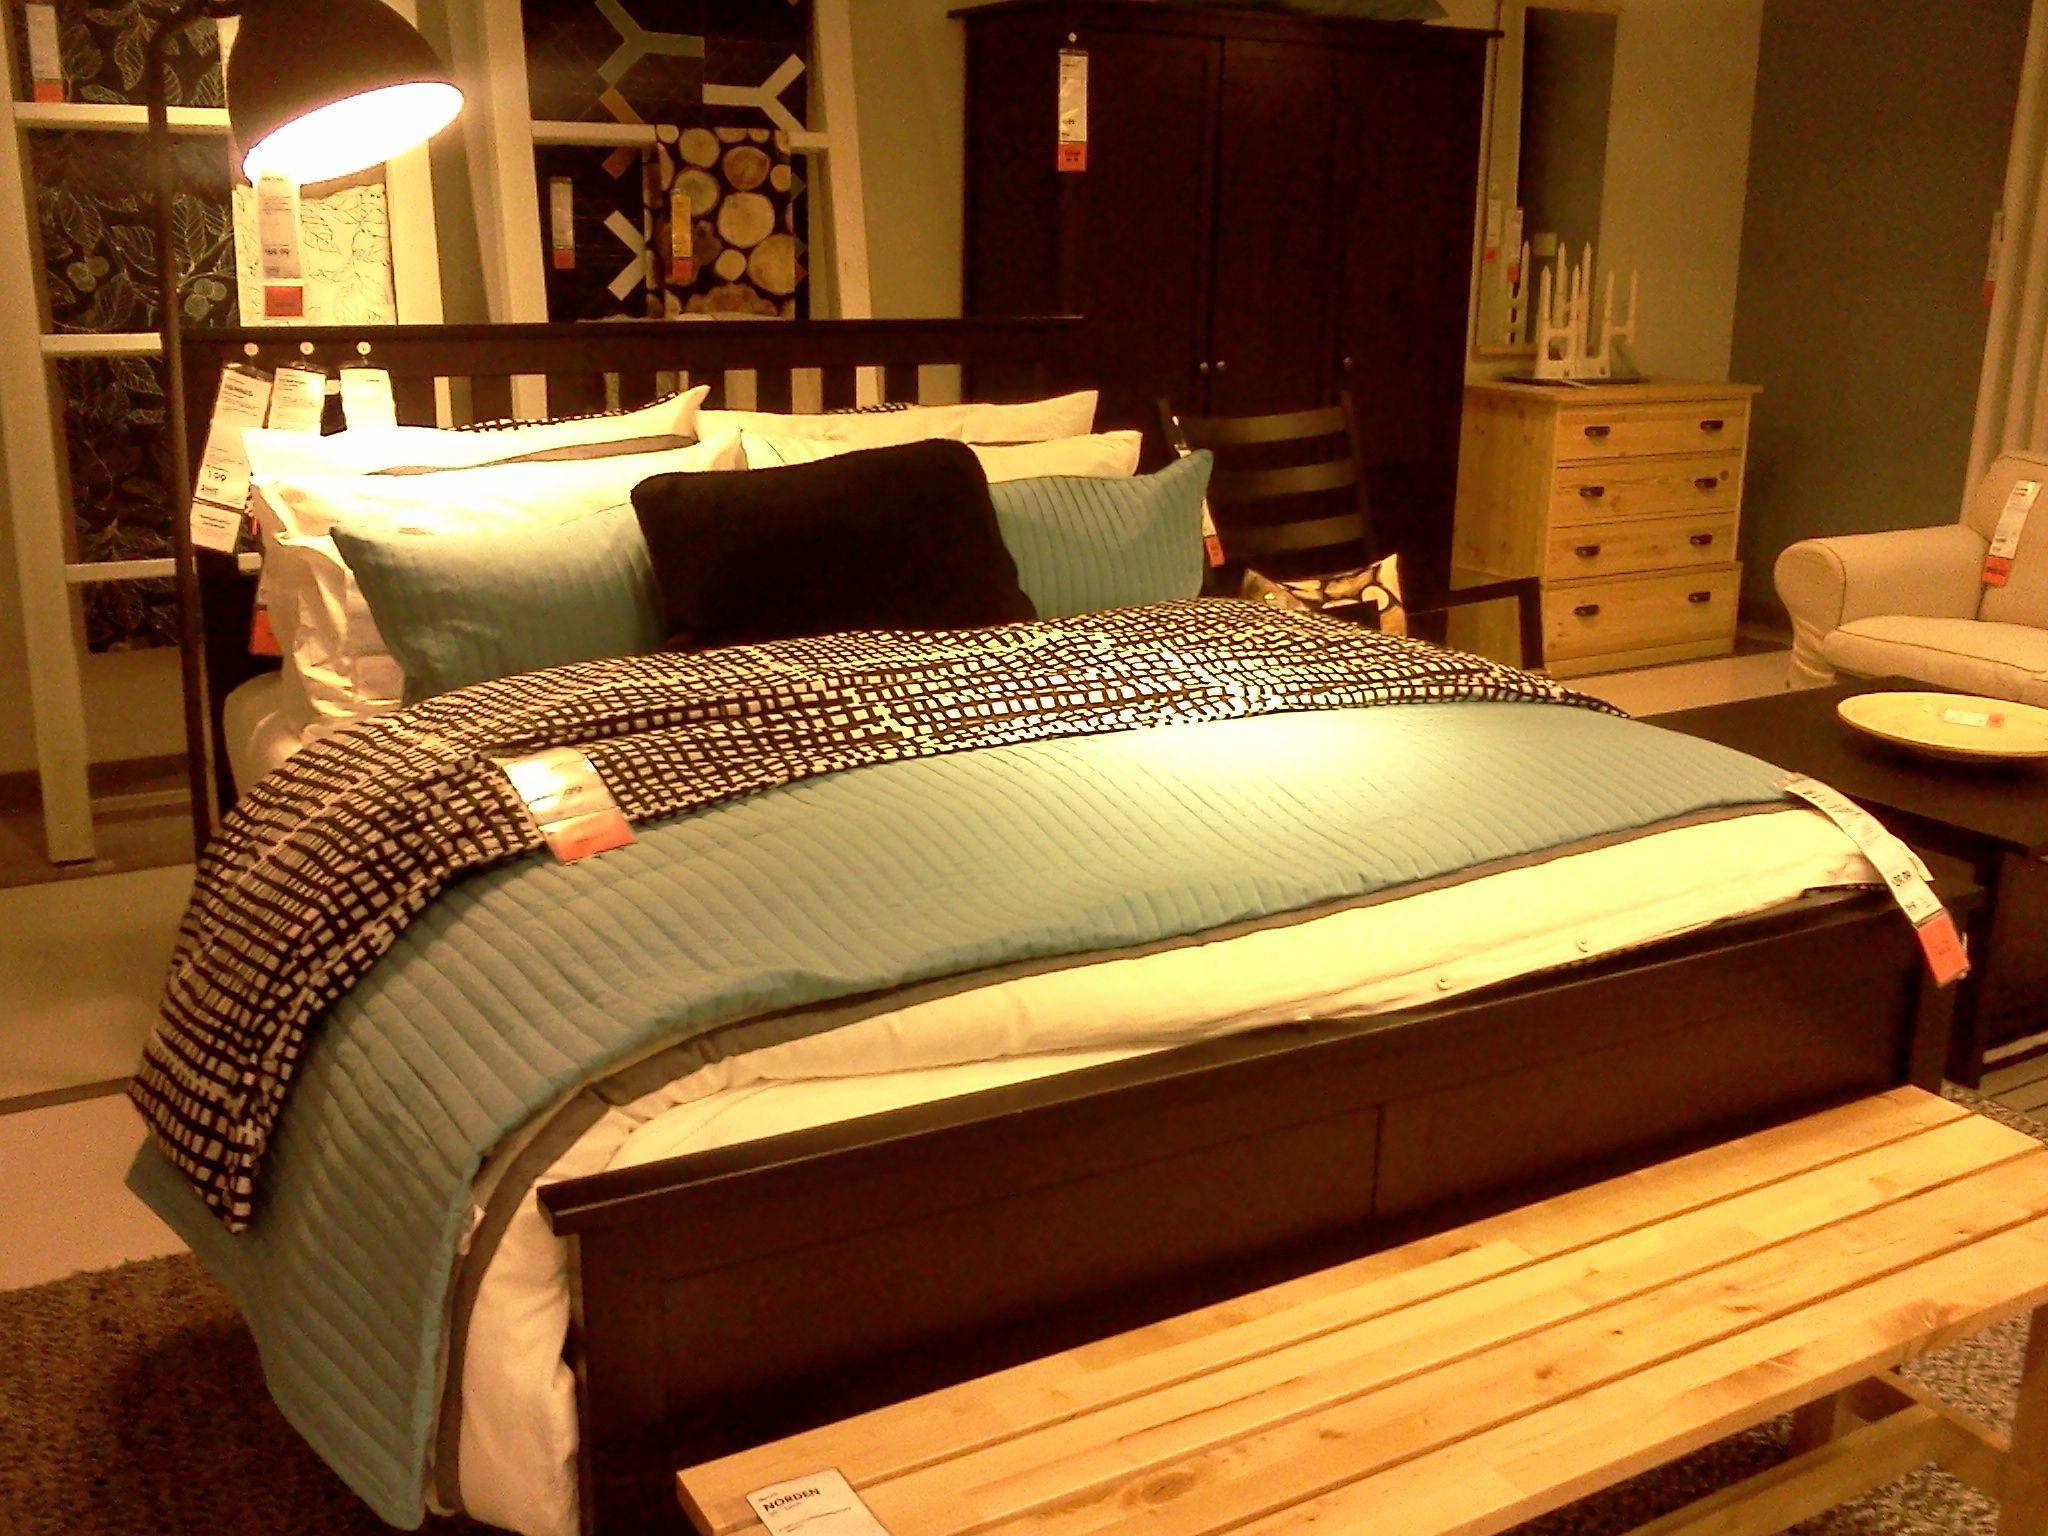 Ikea bed | Ikea bed, Home, Master bedroom